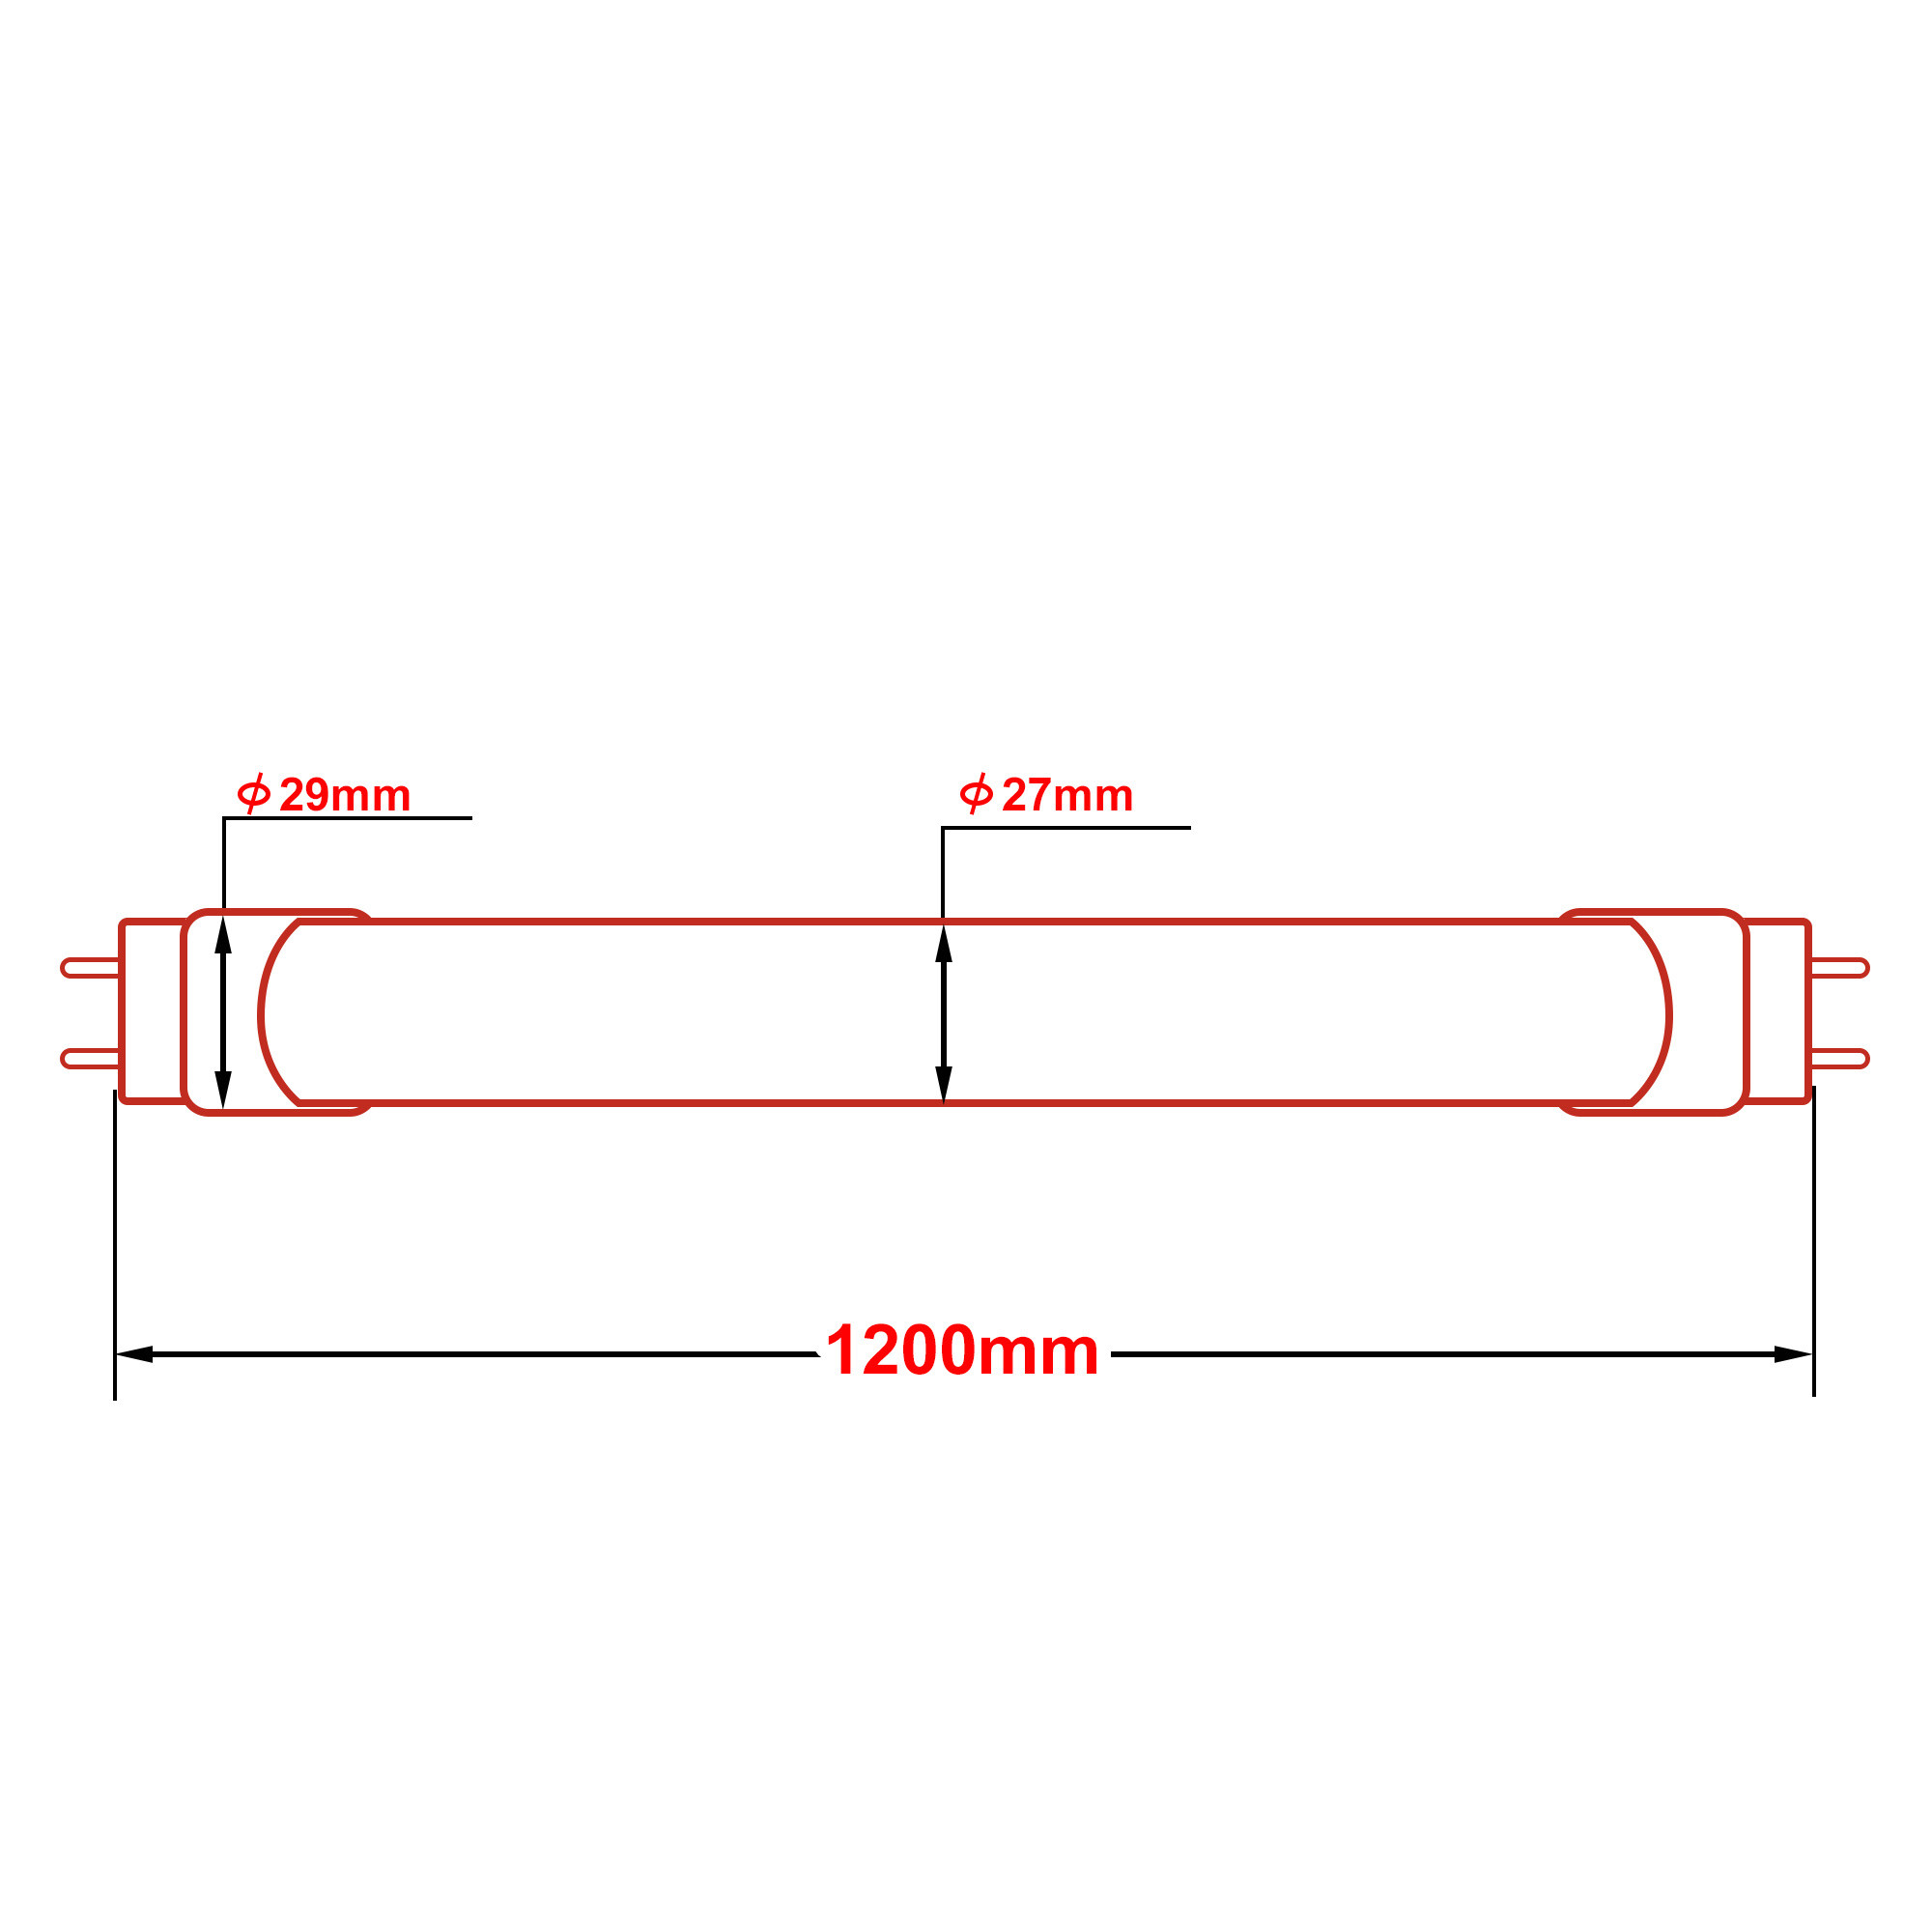 5630 Smd Led Driver Tube Light Circuit Circuit Diagram Centre